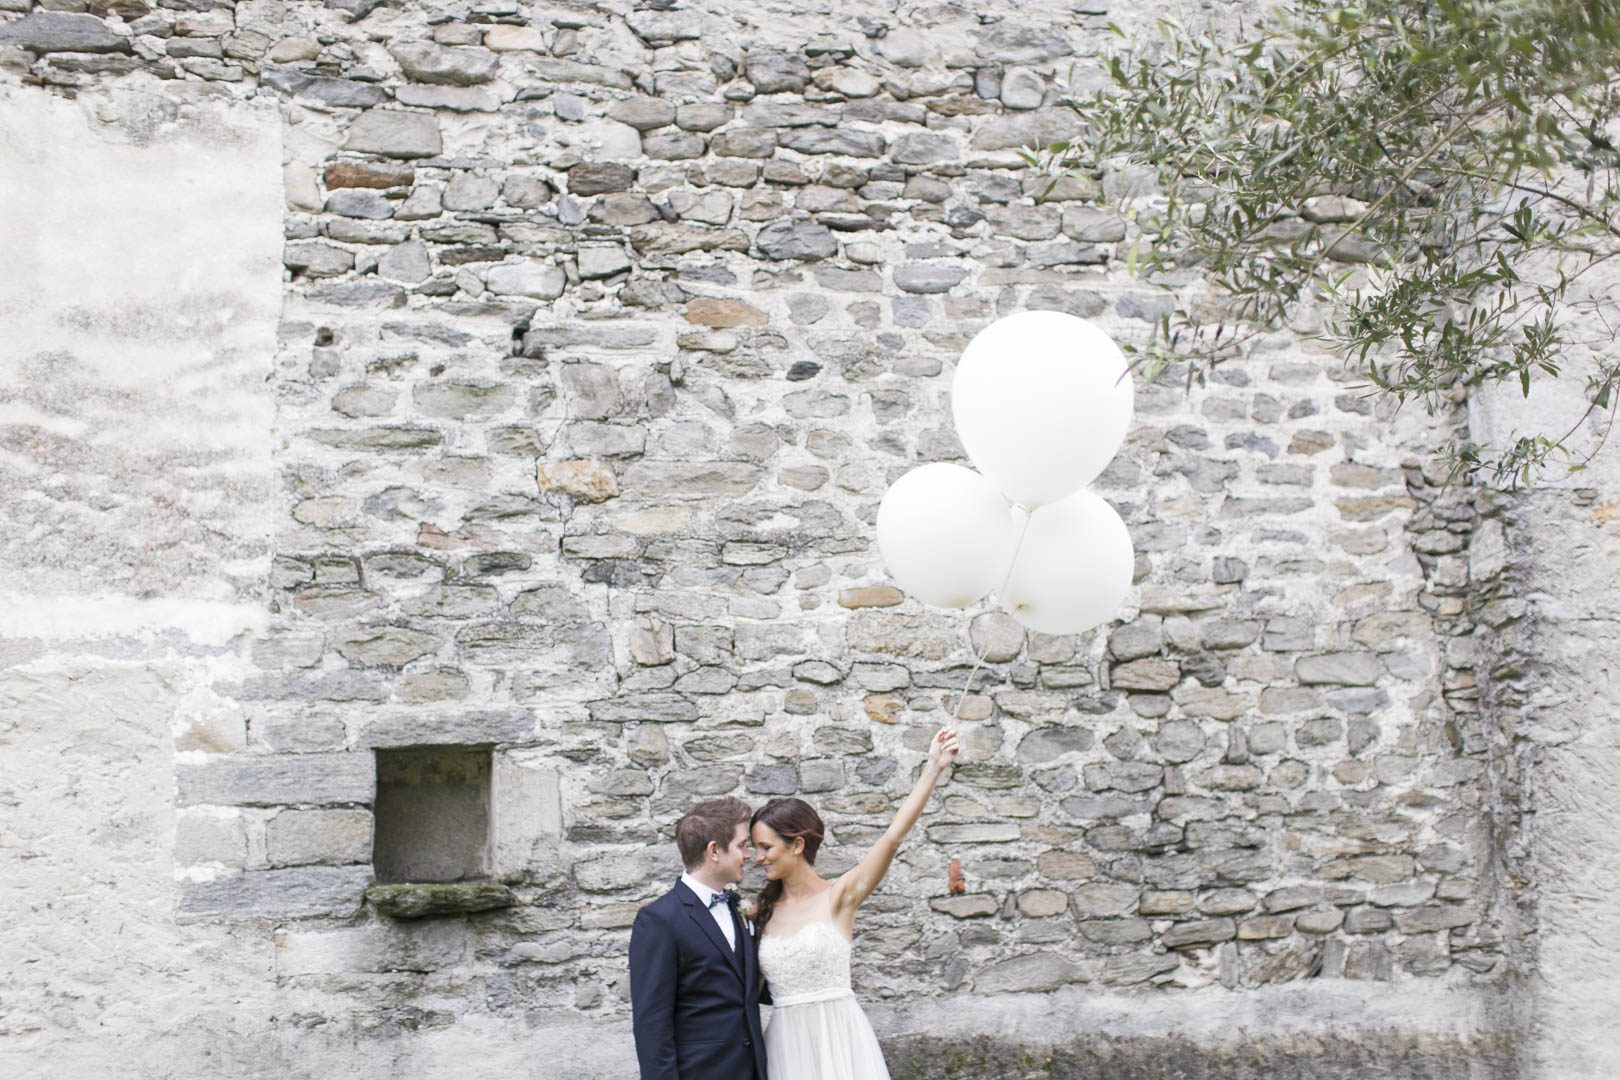 Hochzeit Tessin Fotoshooting The Wedding Day